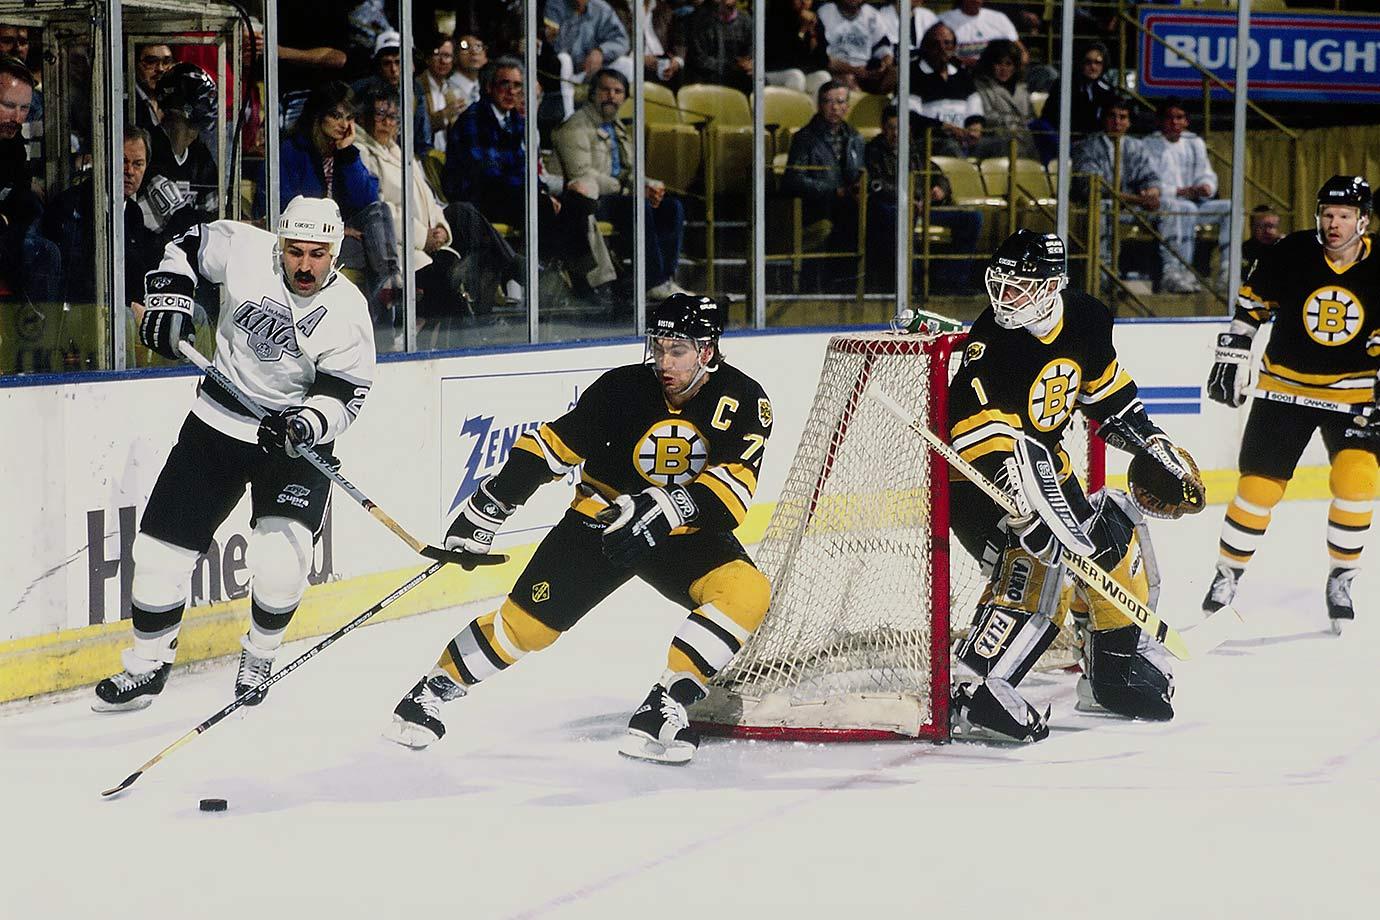 Feb. 15, 1989 — Boston Bruins vs. Los Angeles Kings